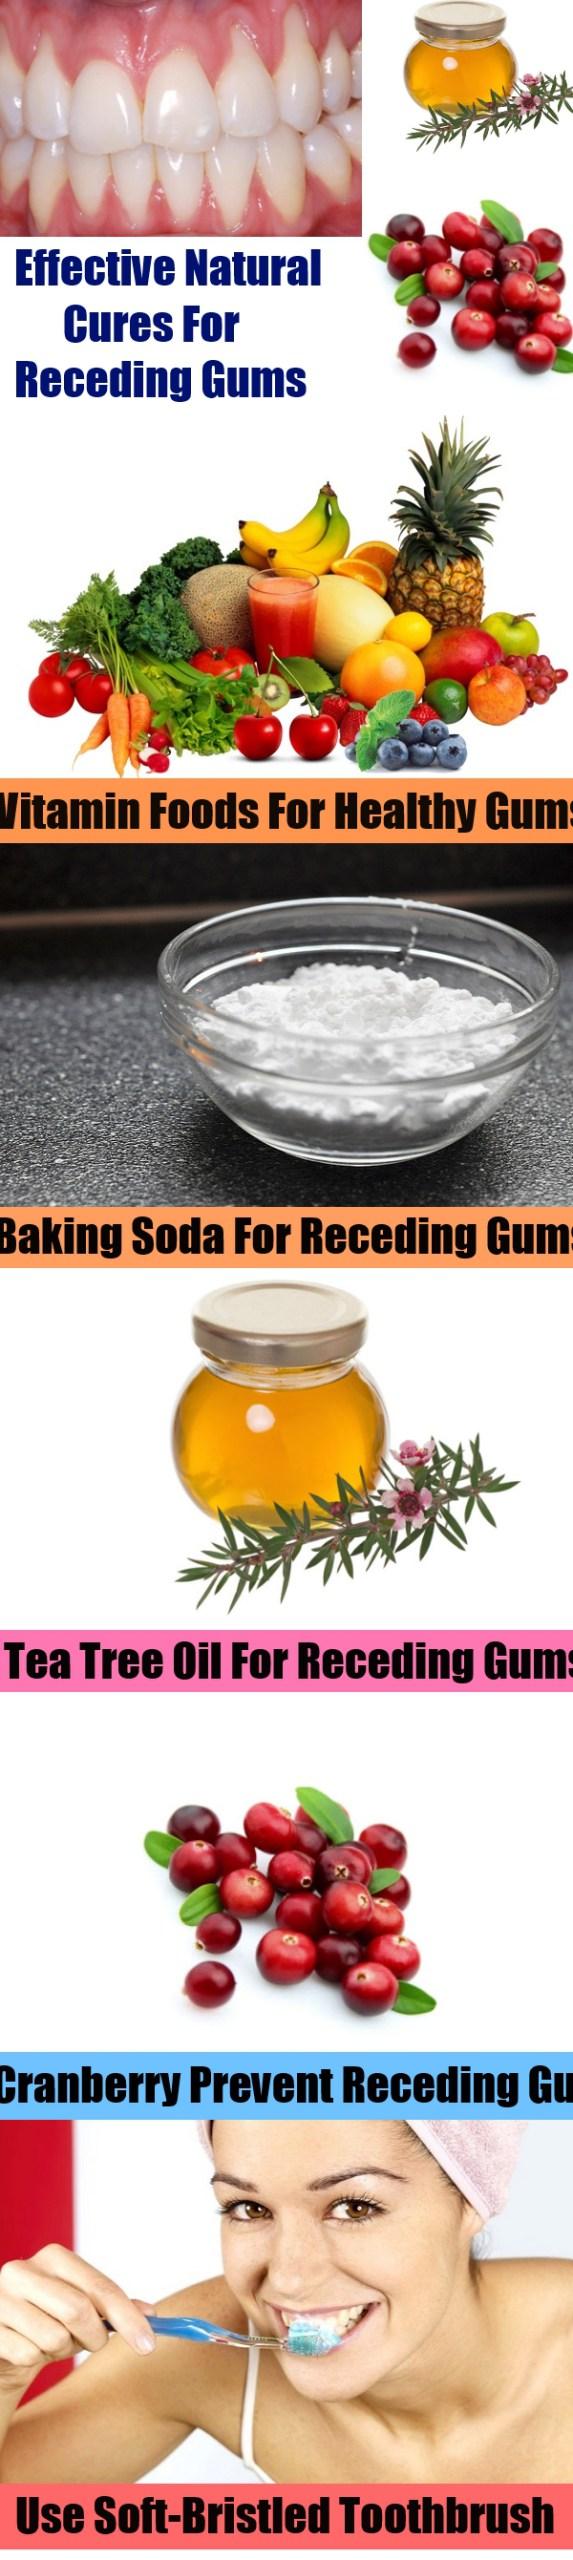 Effective Natural Cures For Receding Gums